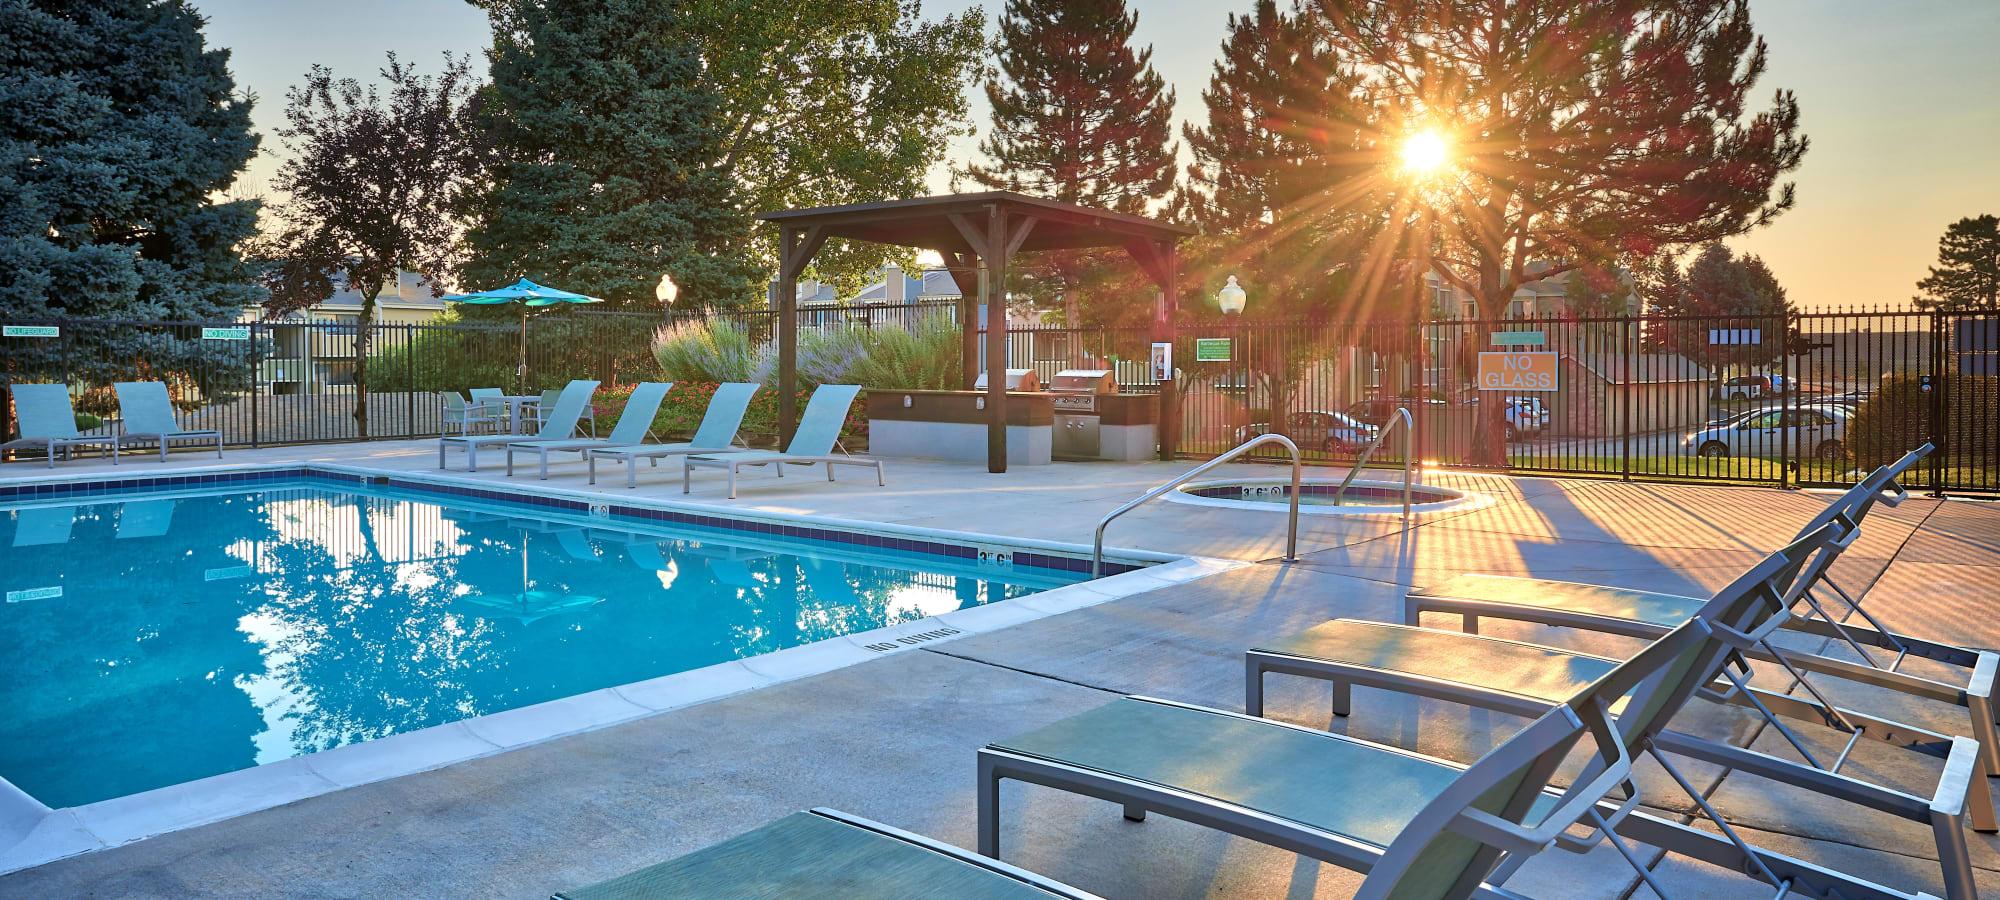 Alton Green Apartments in Denver, Colorado